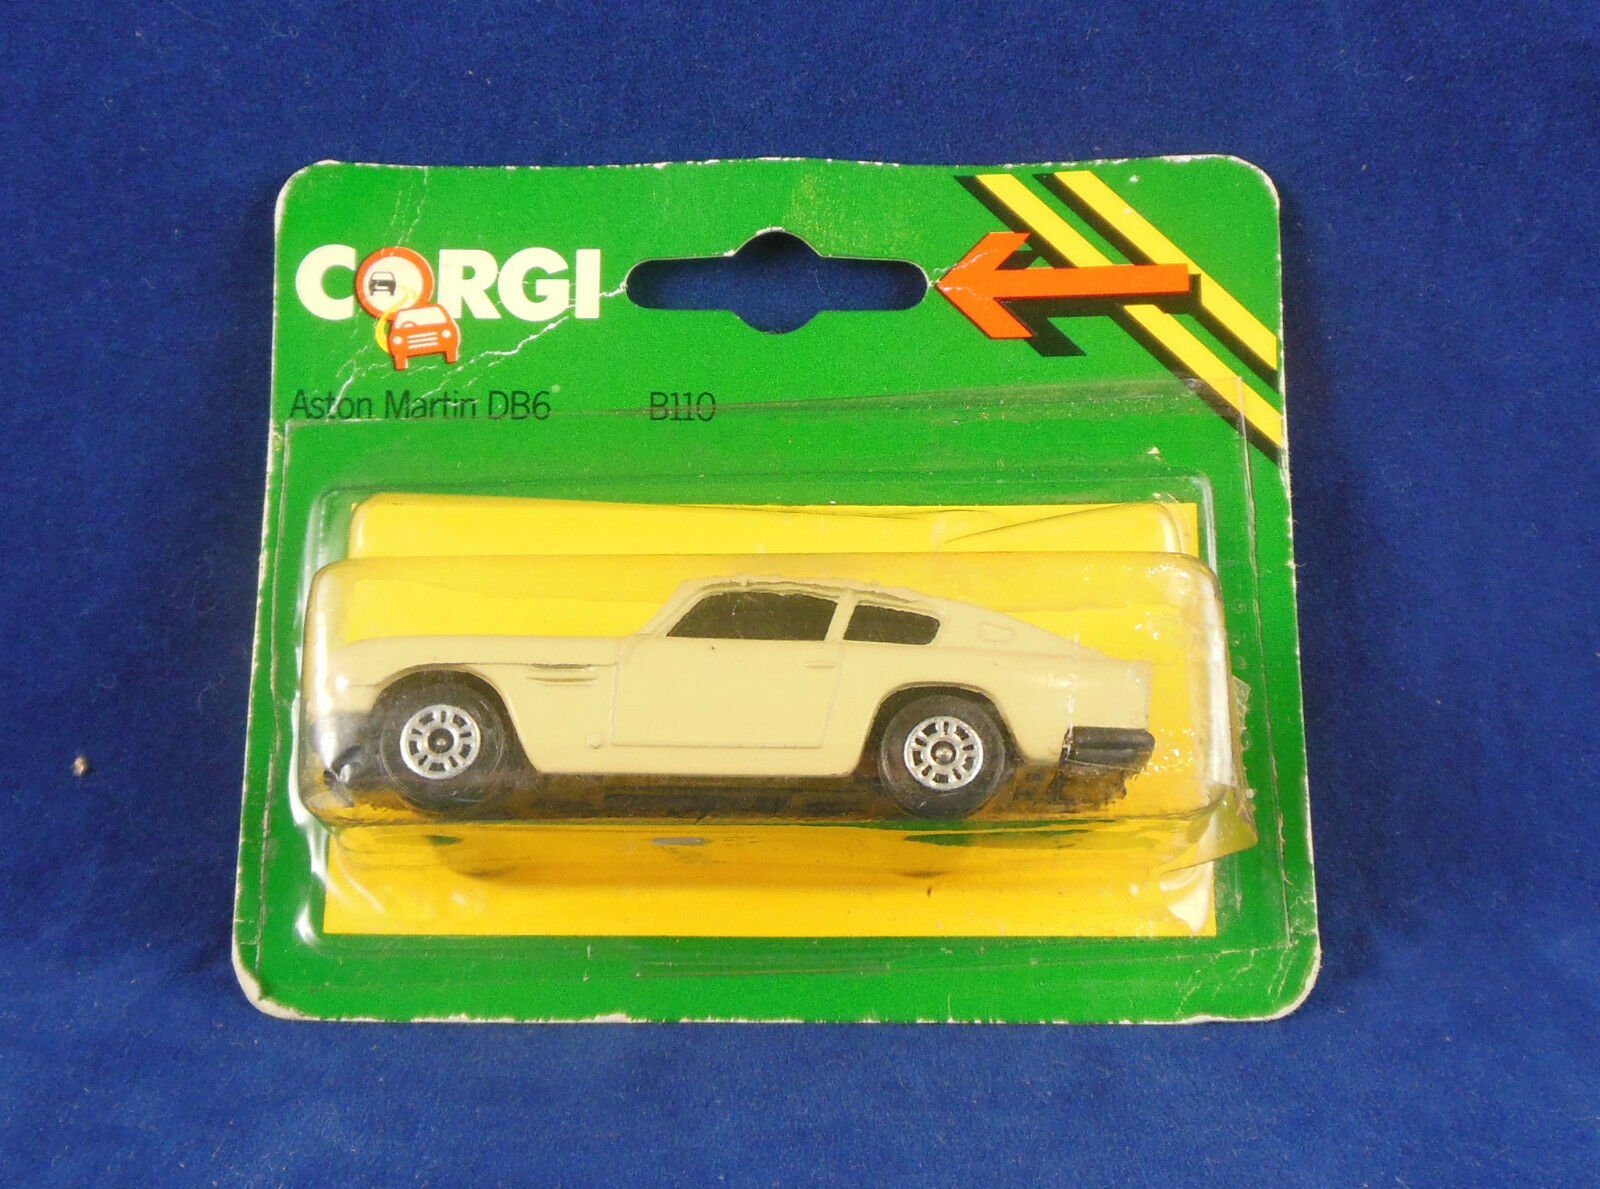 Extrêmement rare 1984 CORGI JUNIORS B110 Aston Martin DB6 en Beige Couleur RARE